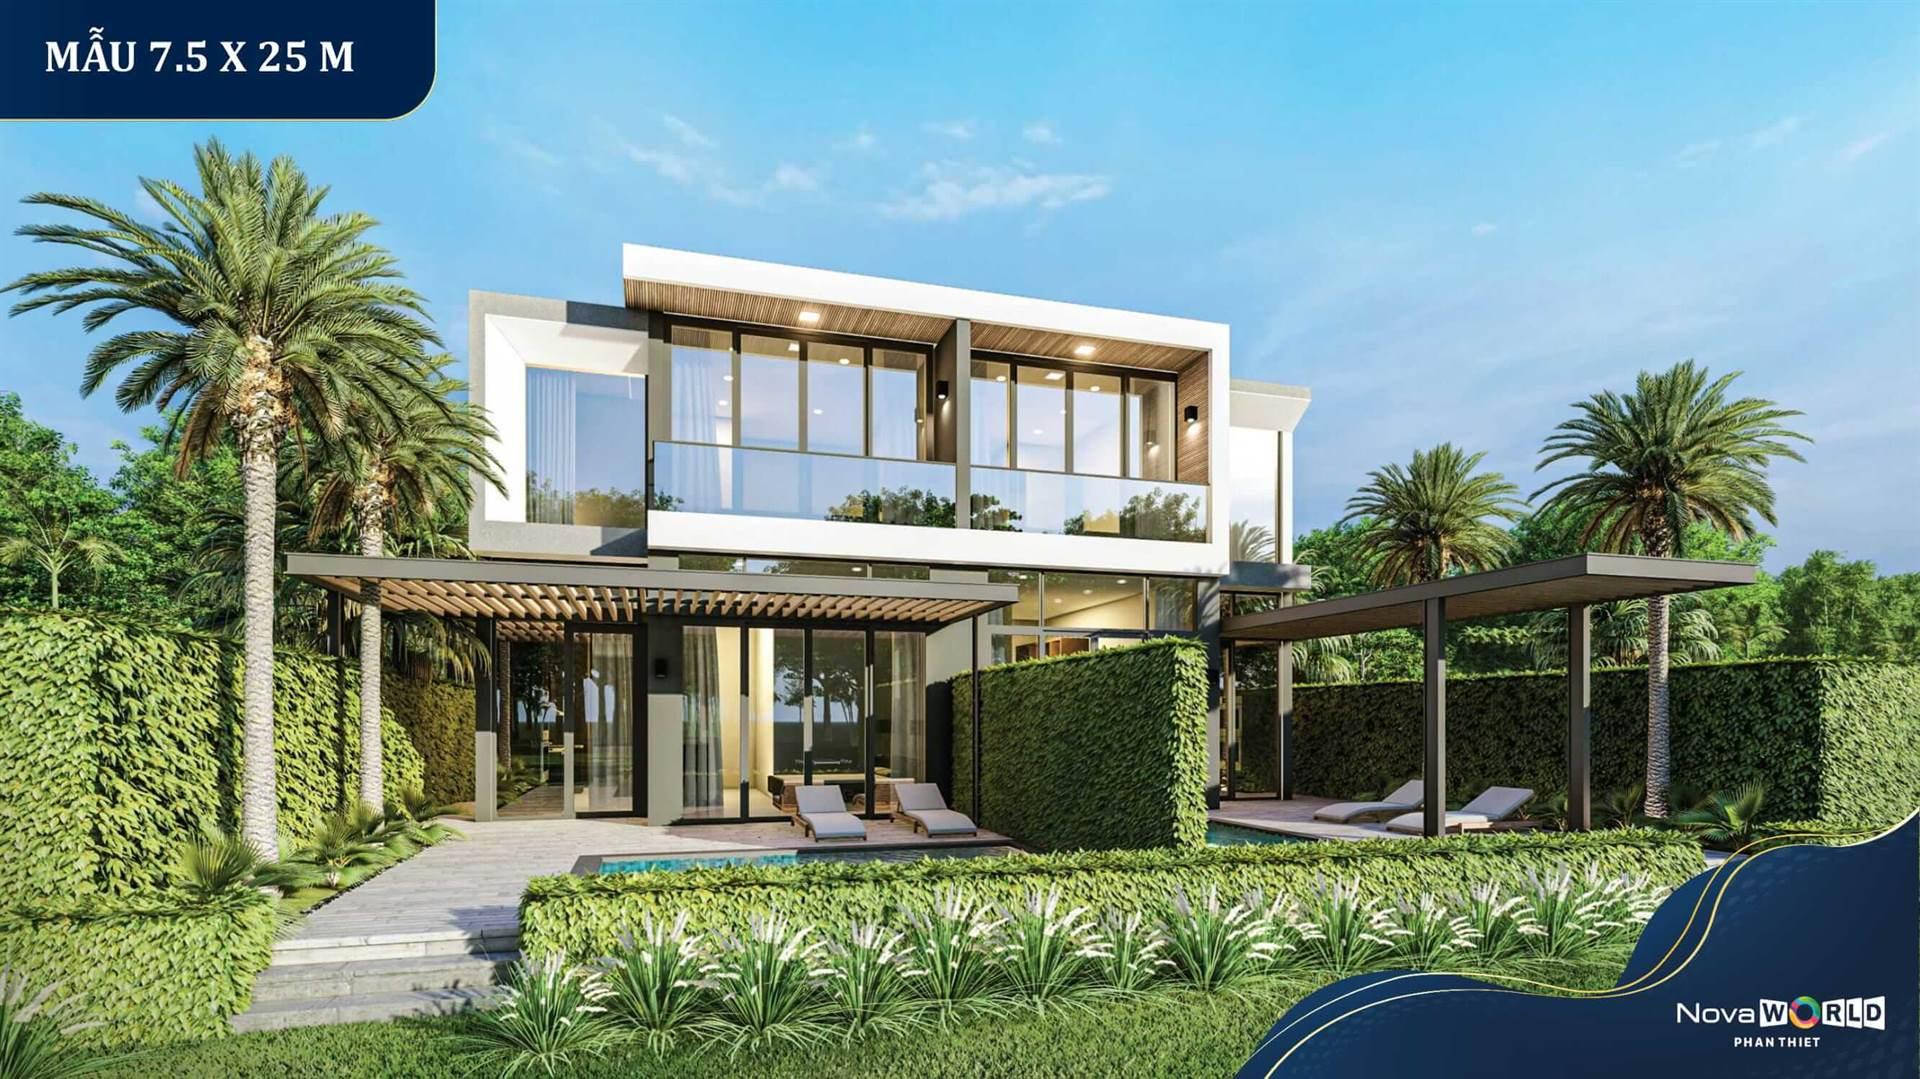 biet-thu-villa-golf-NovaWorld-Phan-Thiet-Binh-Thuan-Novaland-kich-thuoc-7.5x25